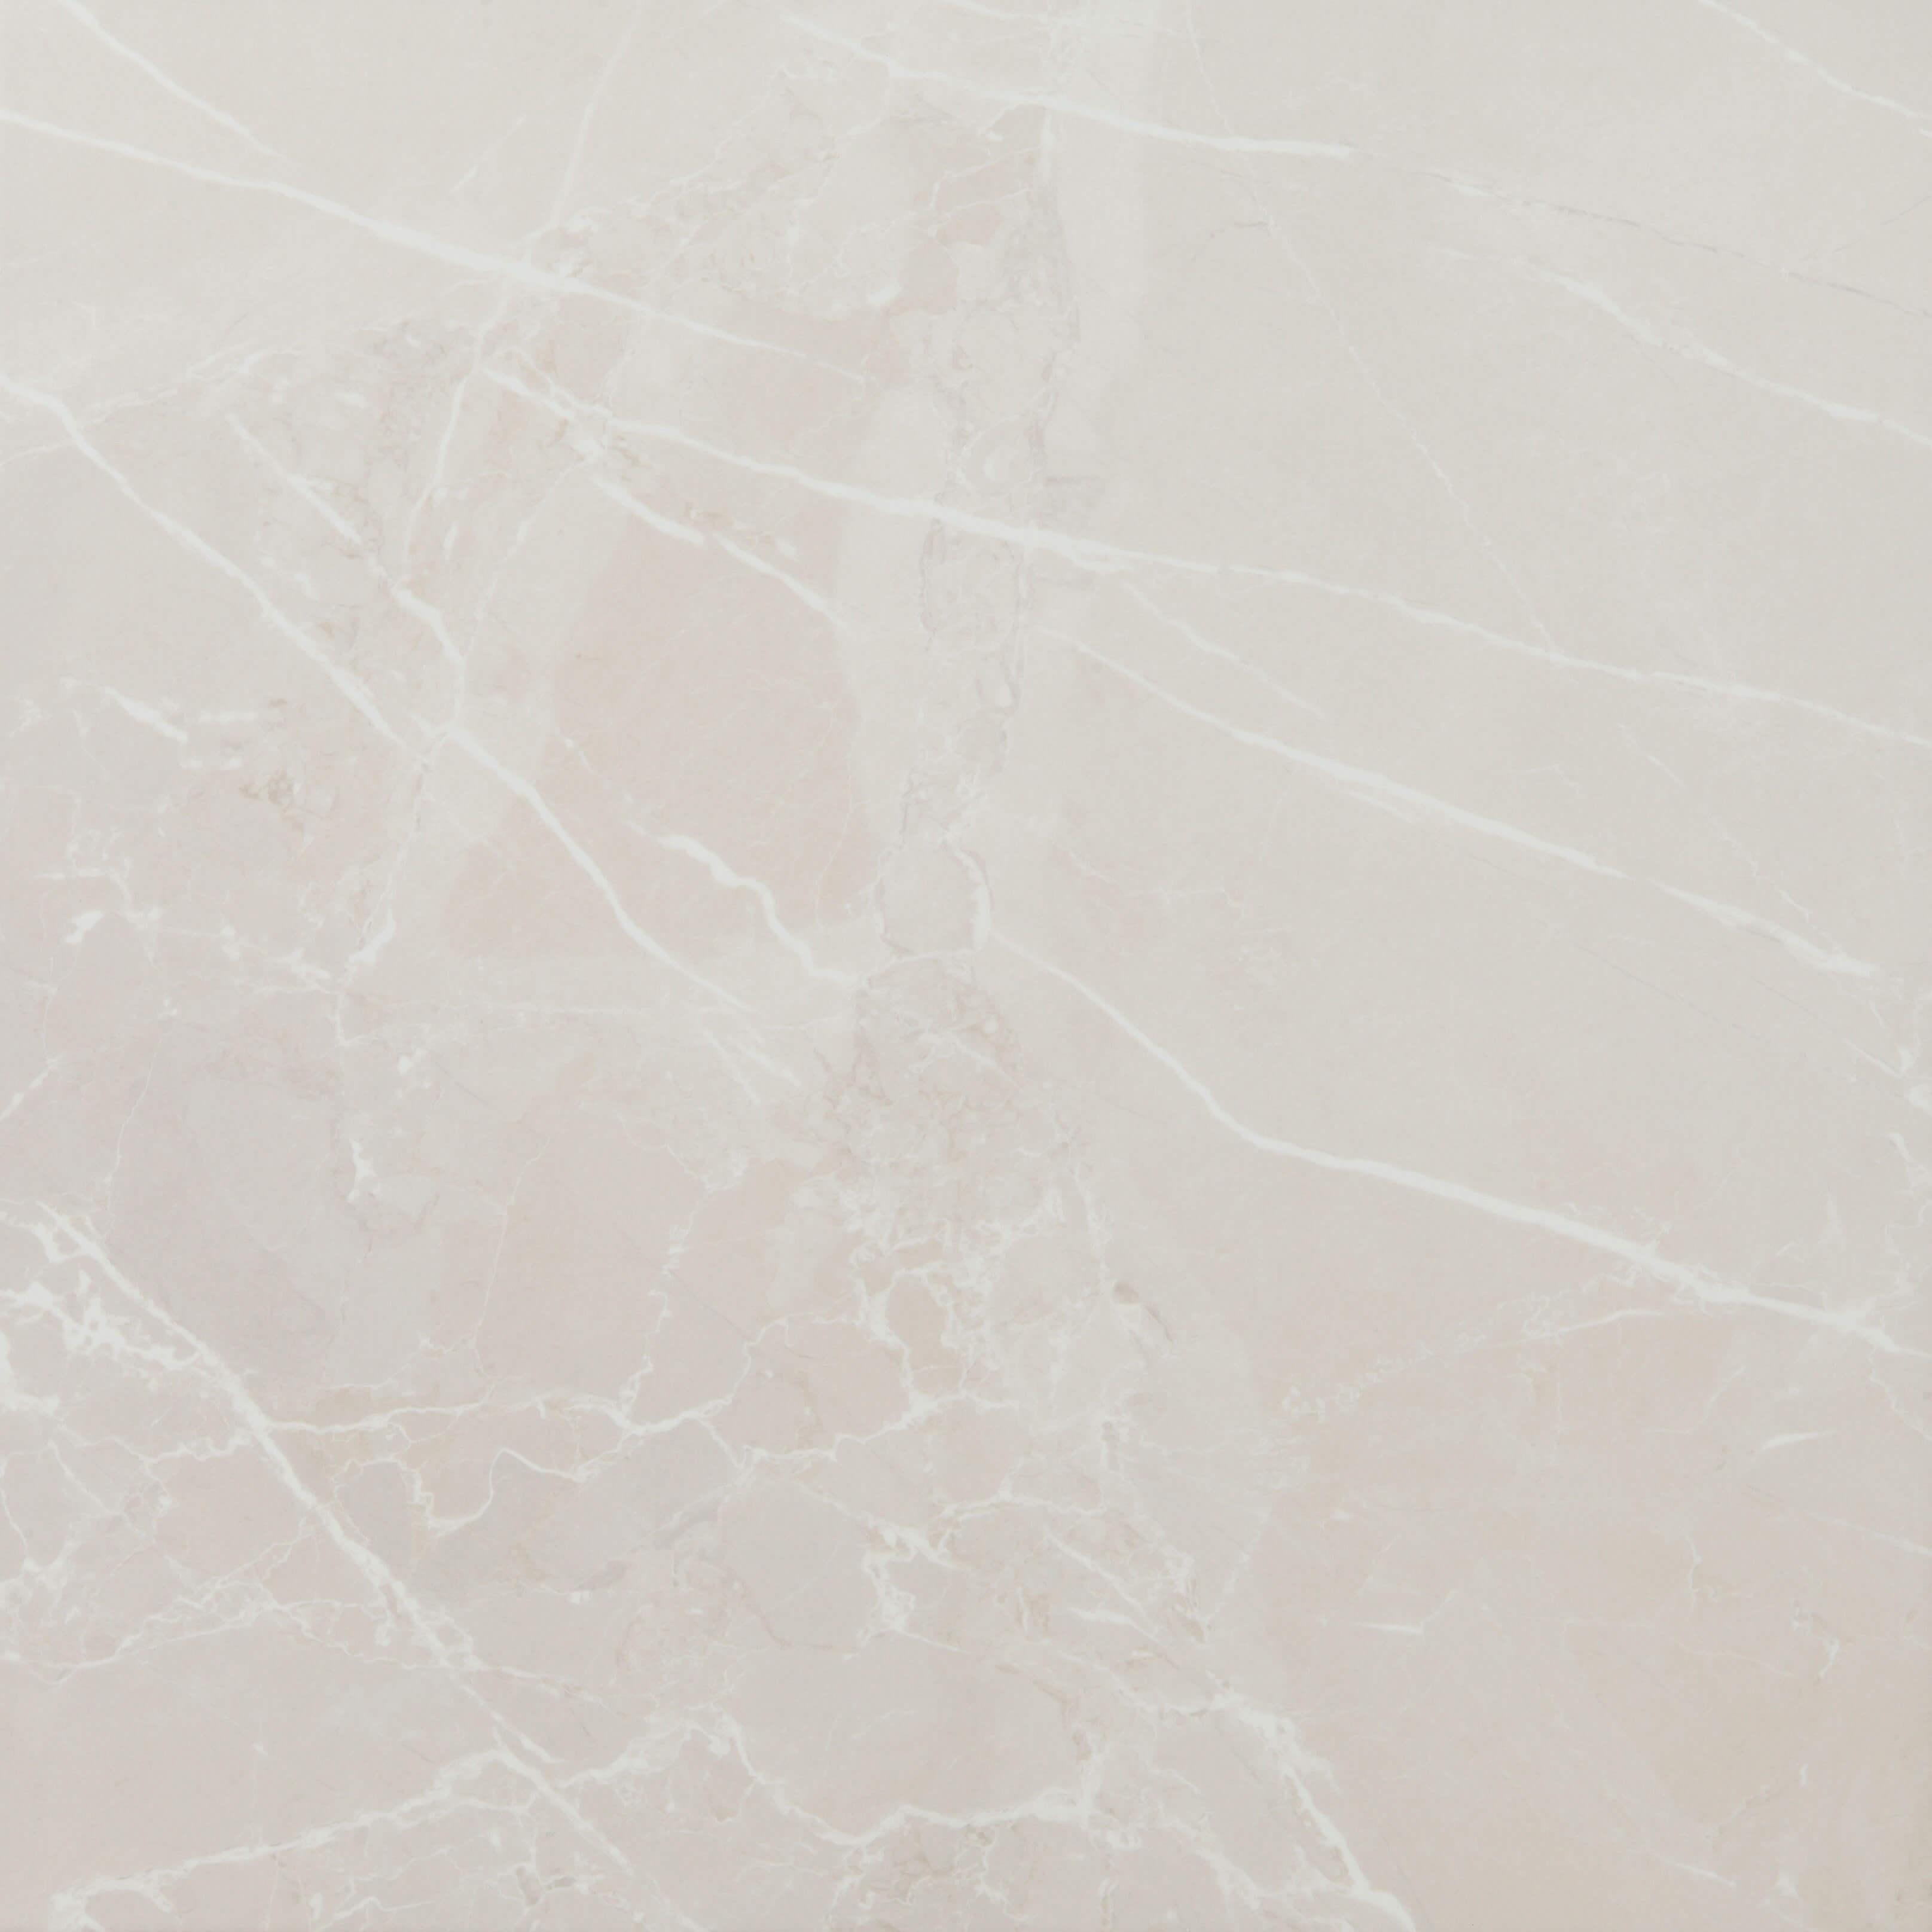 Carrelage sol poli Museum Ivory aspect marbre